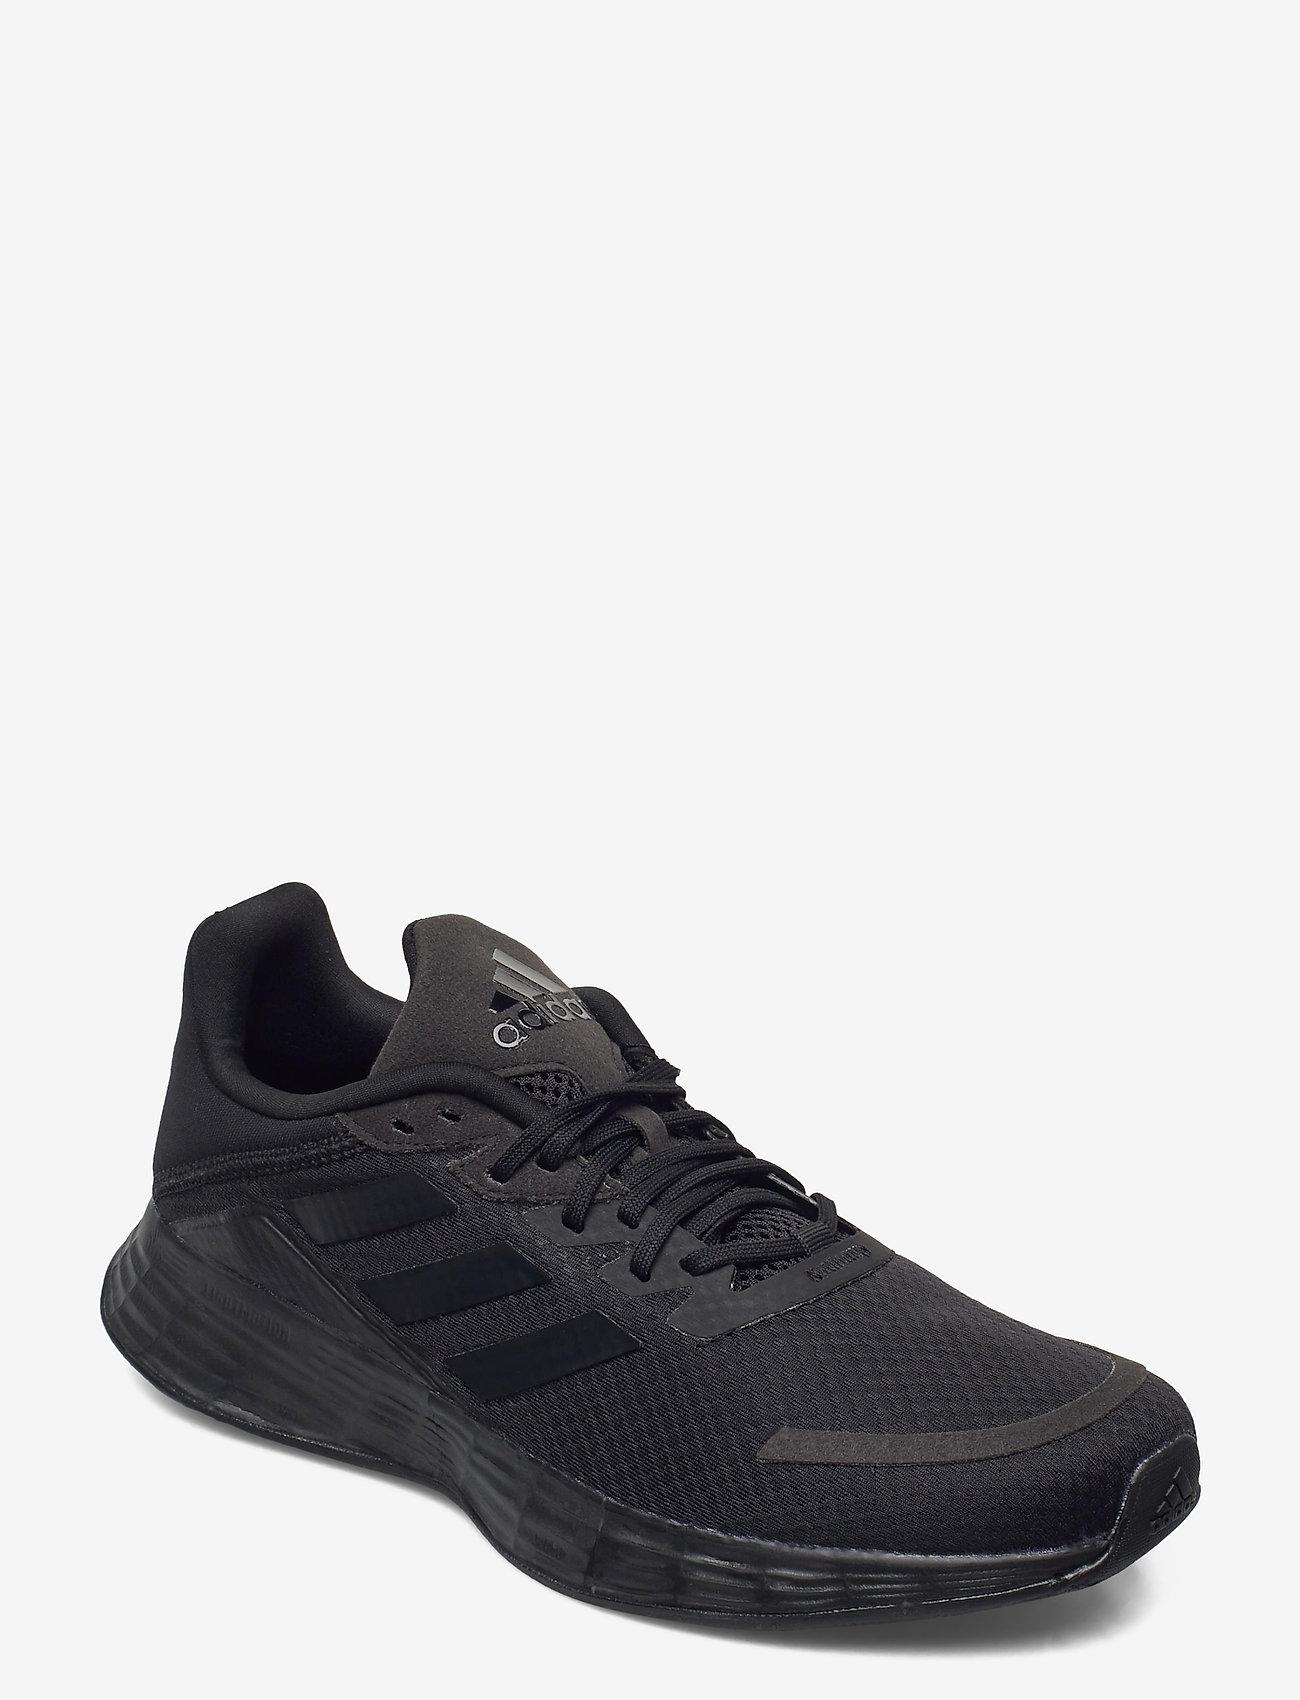 adidas Performance - Duramo SL - löbesko - cblack/cblack/ftwwht - 0